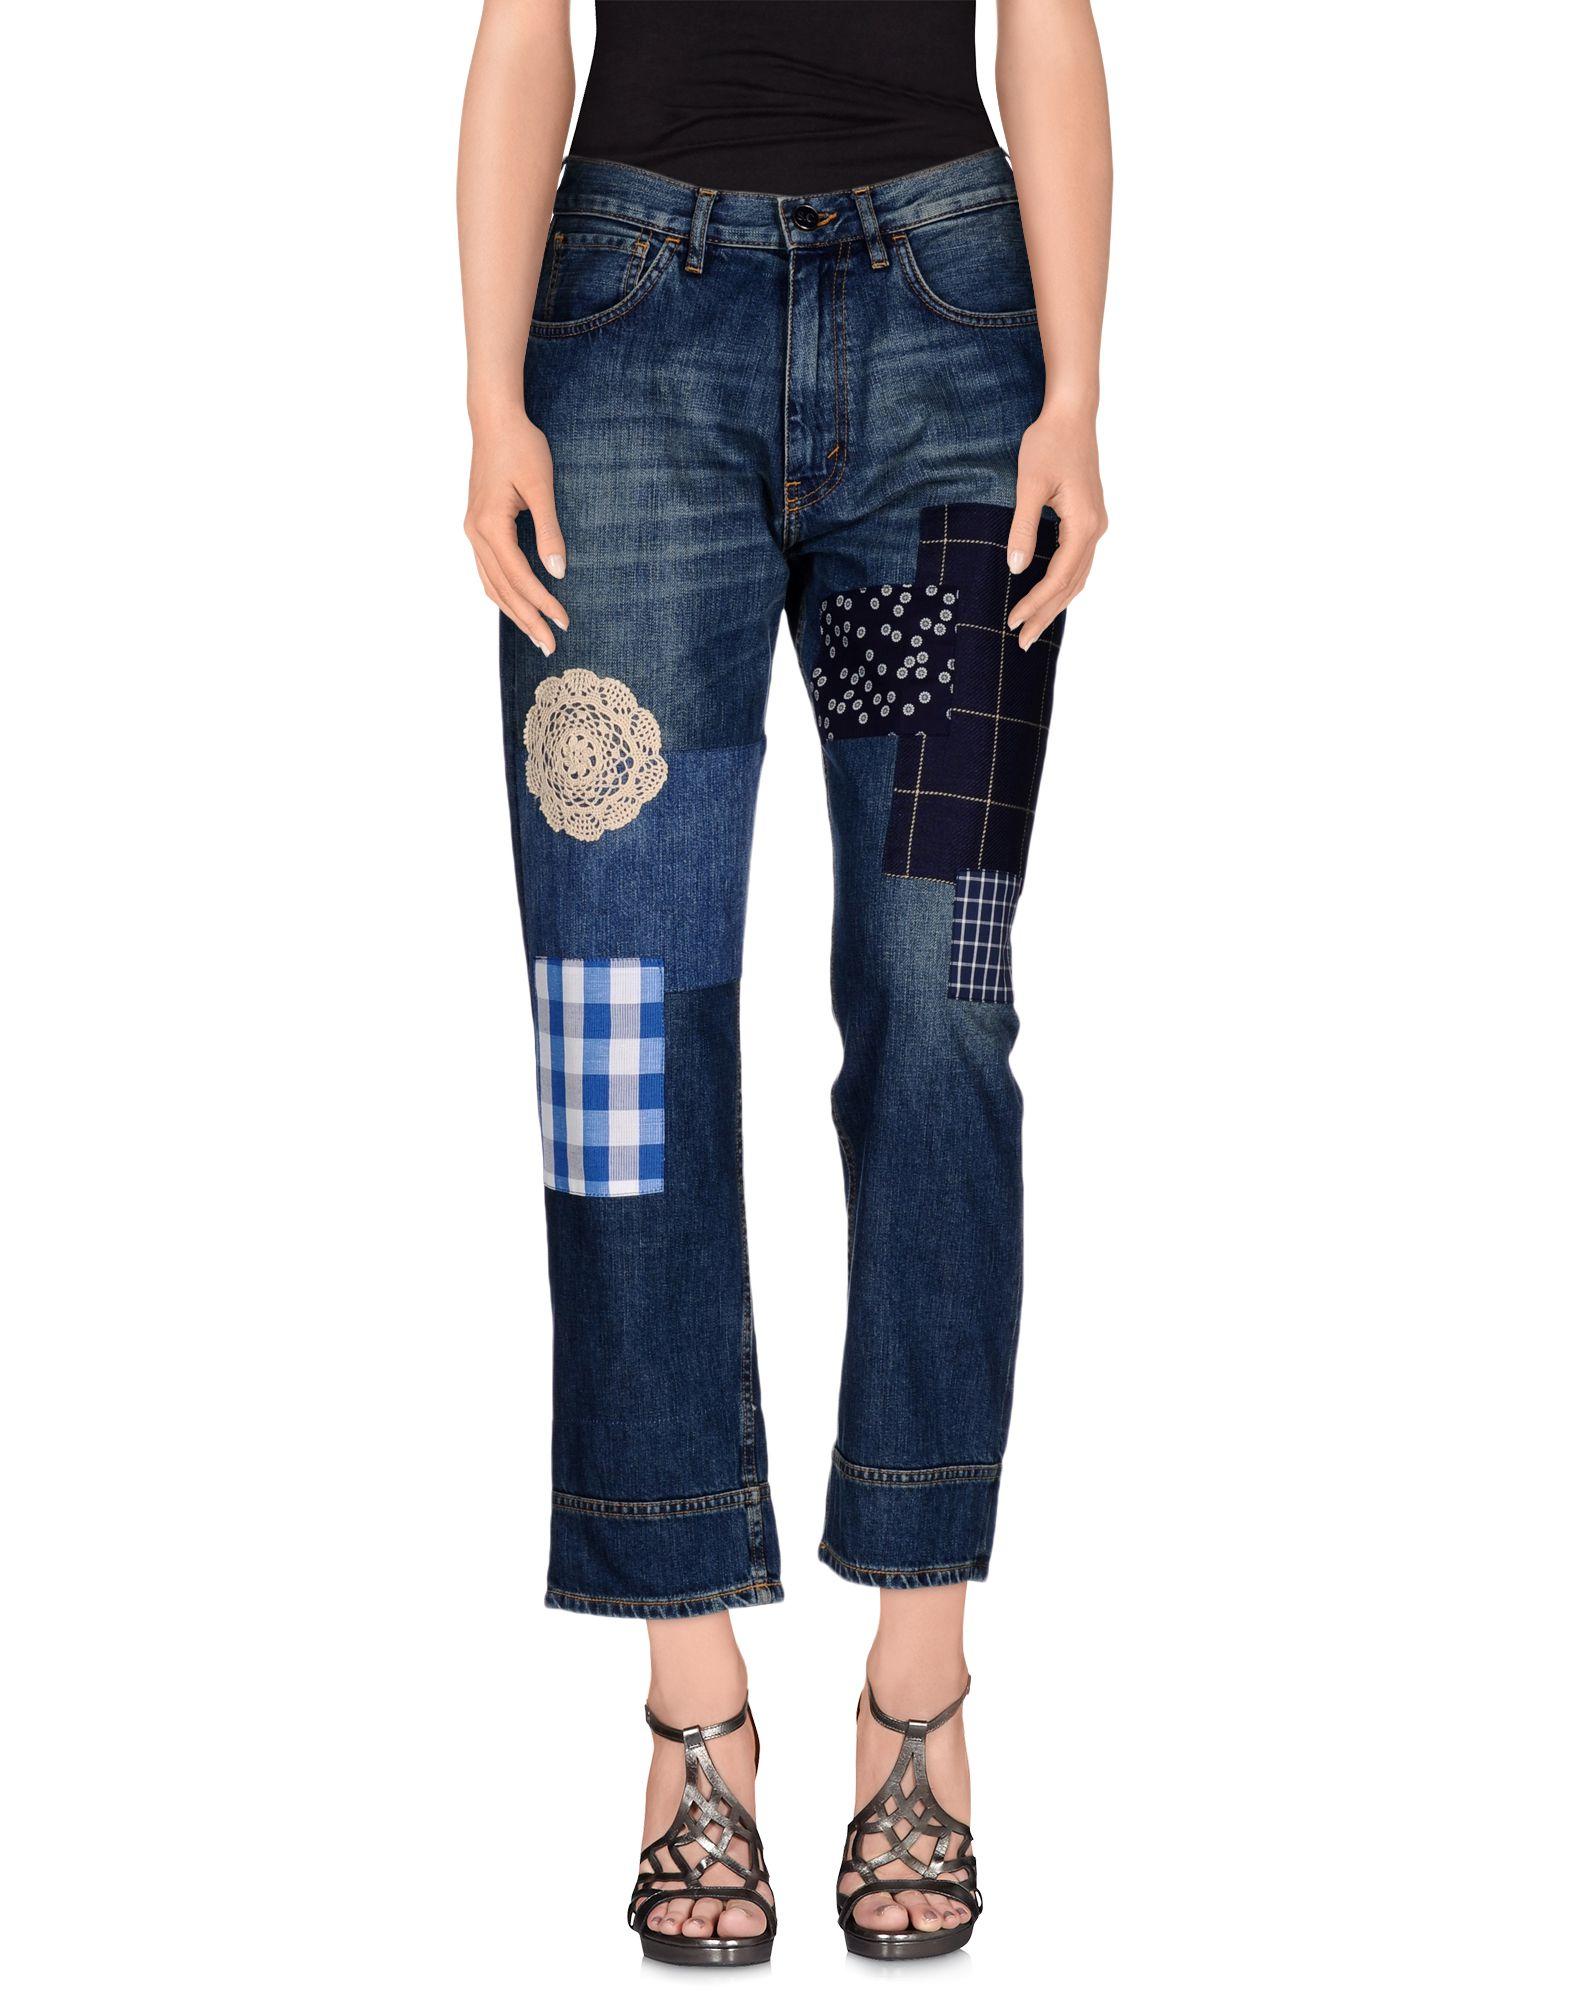 Erika Cavallini Semi Couture Denim Pants in Blue